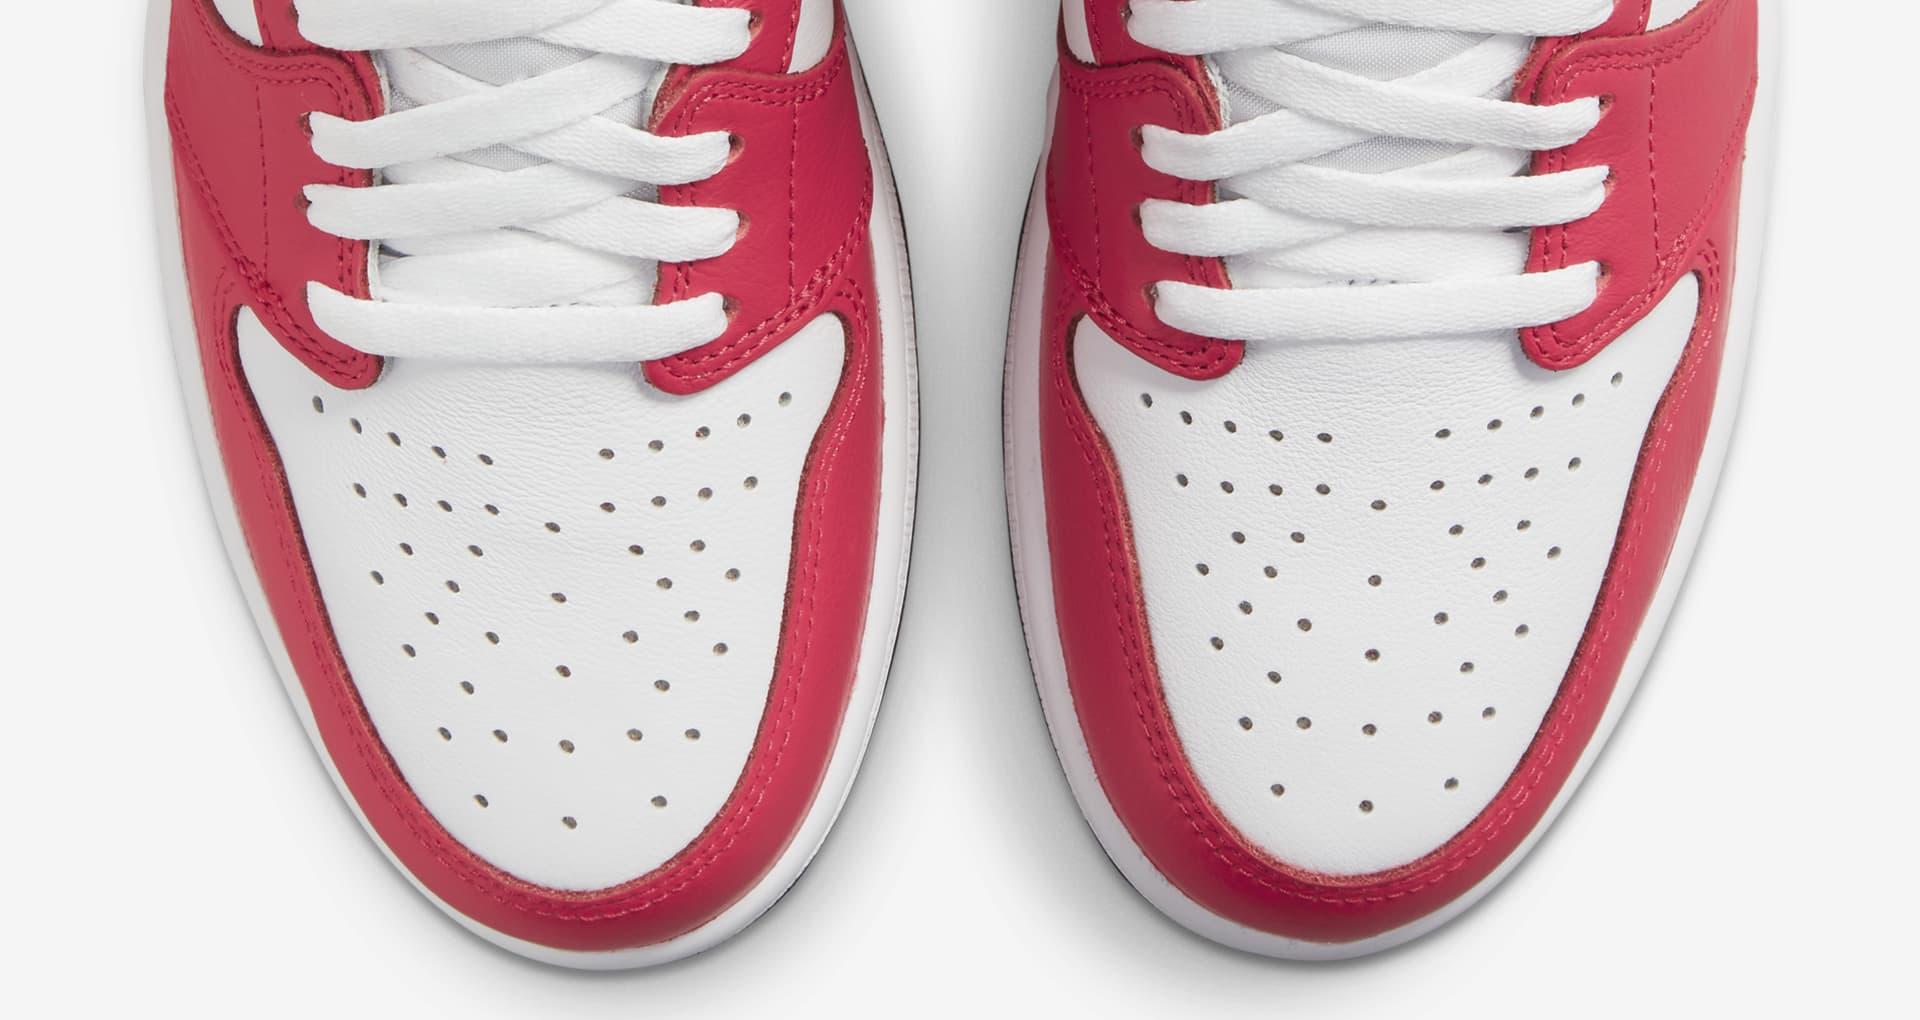 Air Jordan 1 High OG Light Fusion Red 555088-603